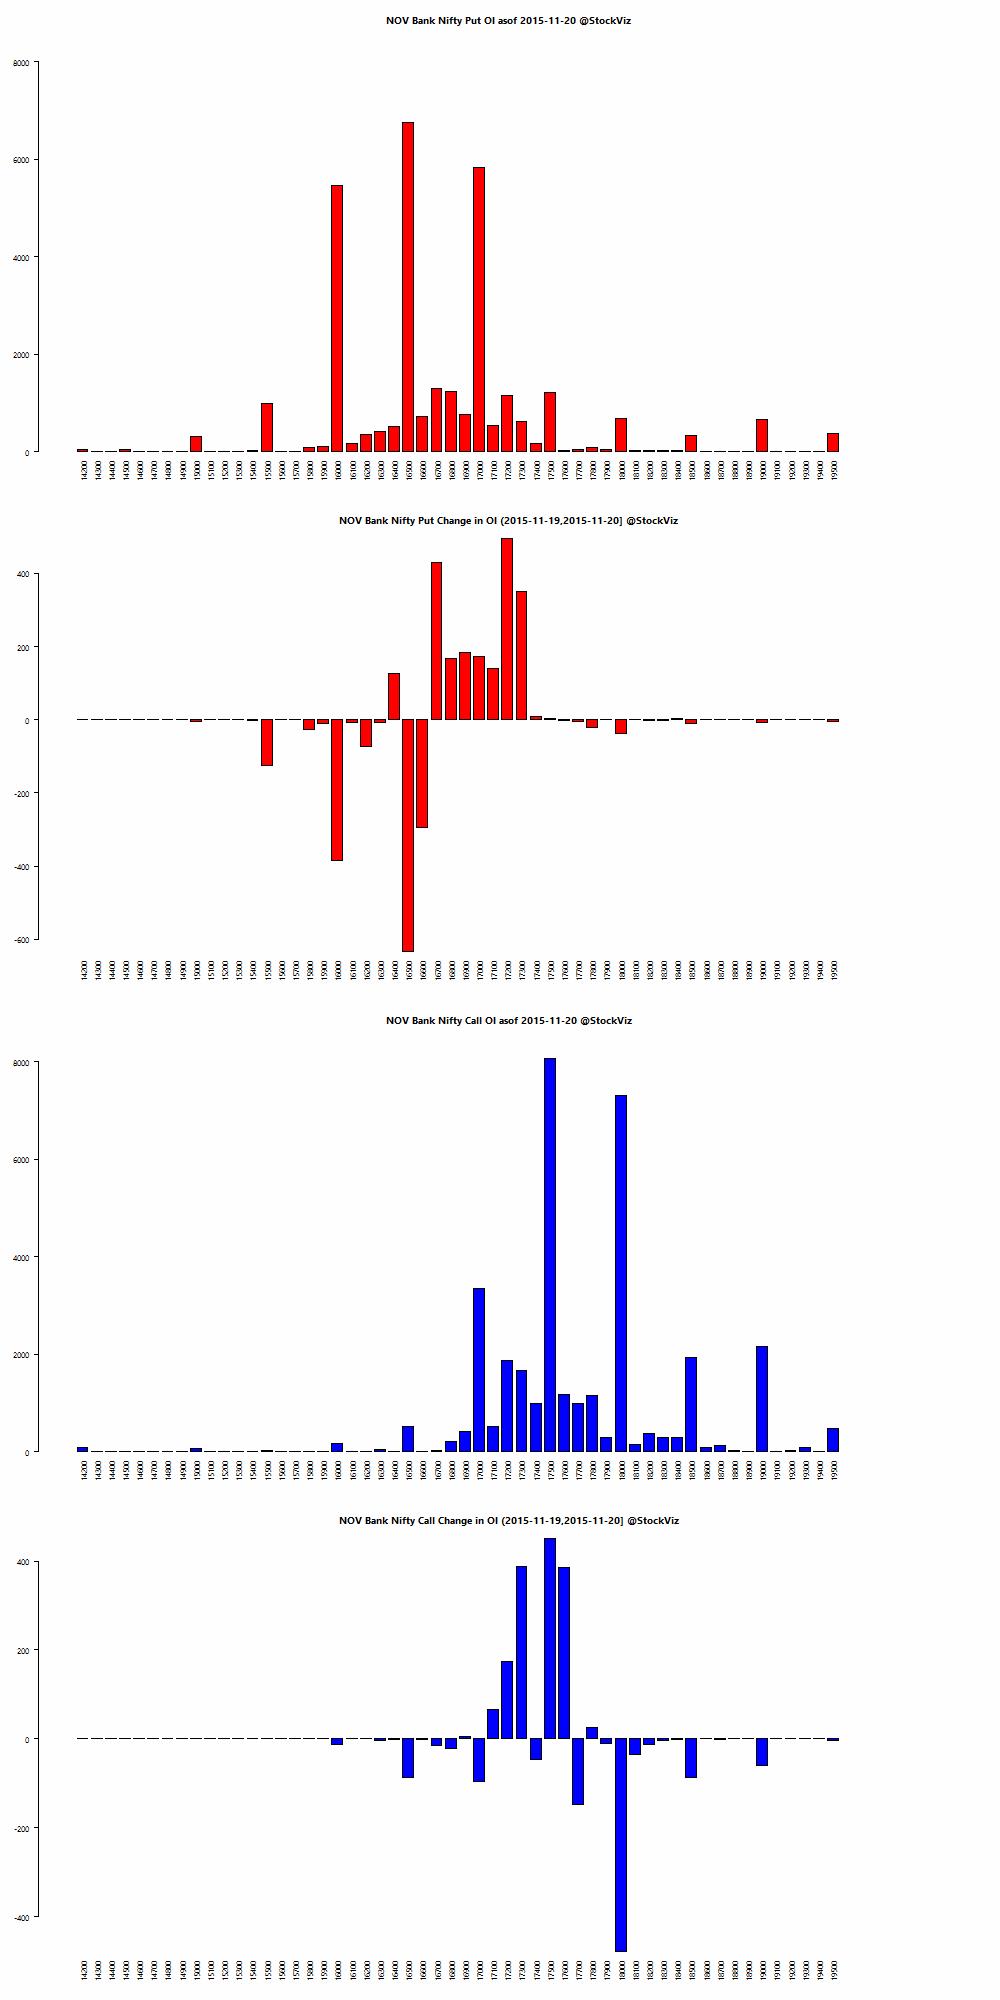 NOV BANKNIFTY OI chart